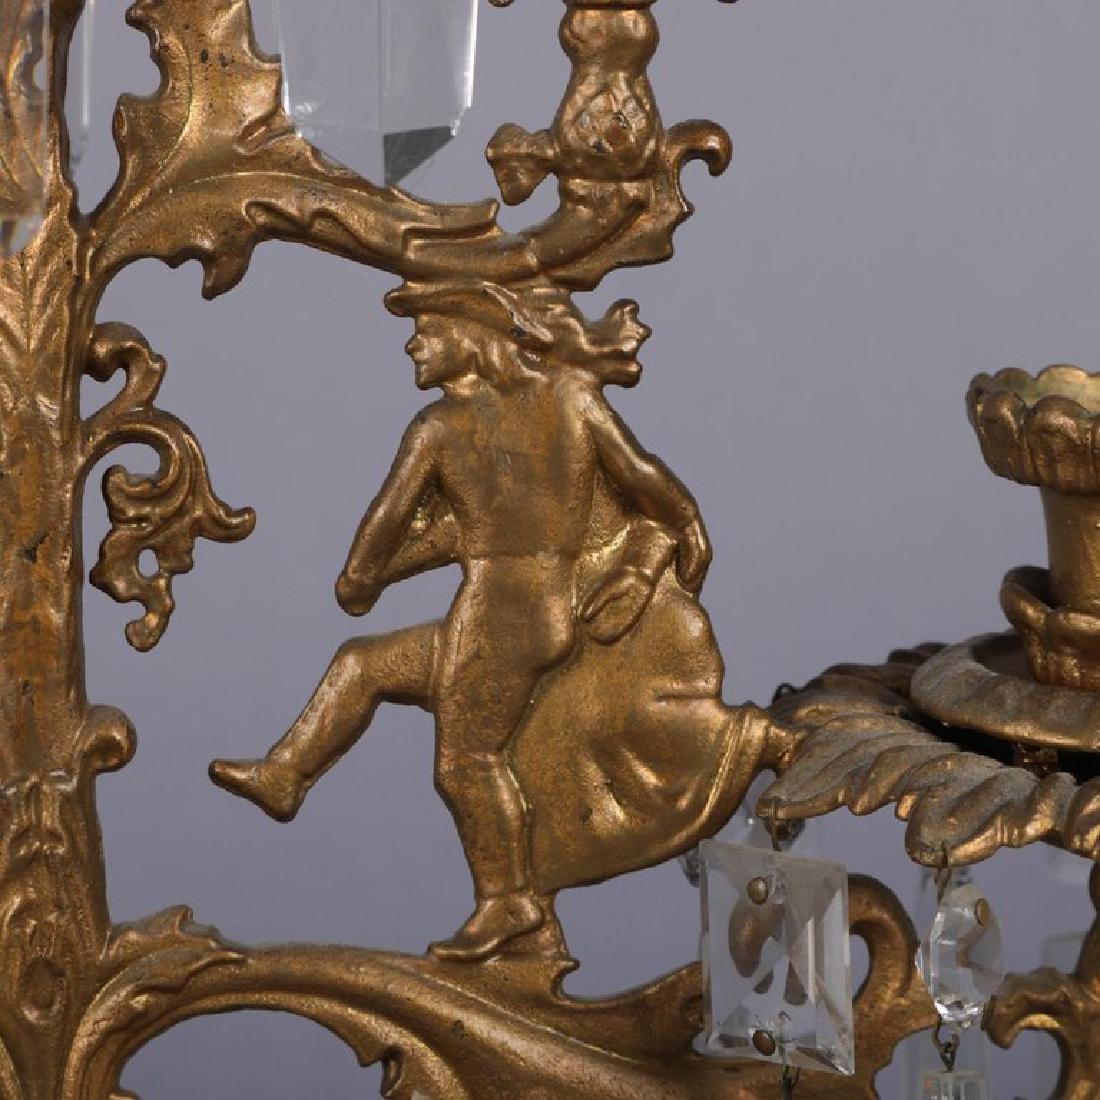 Antique French Gilt Metal & Crystal Figural Girandole - 7